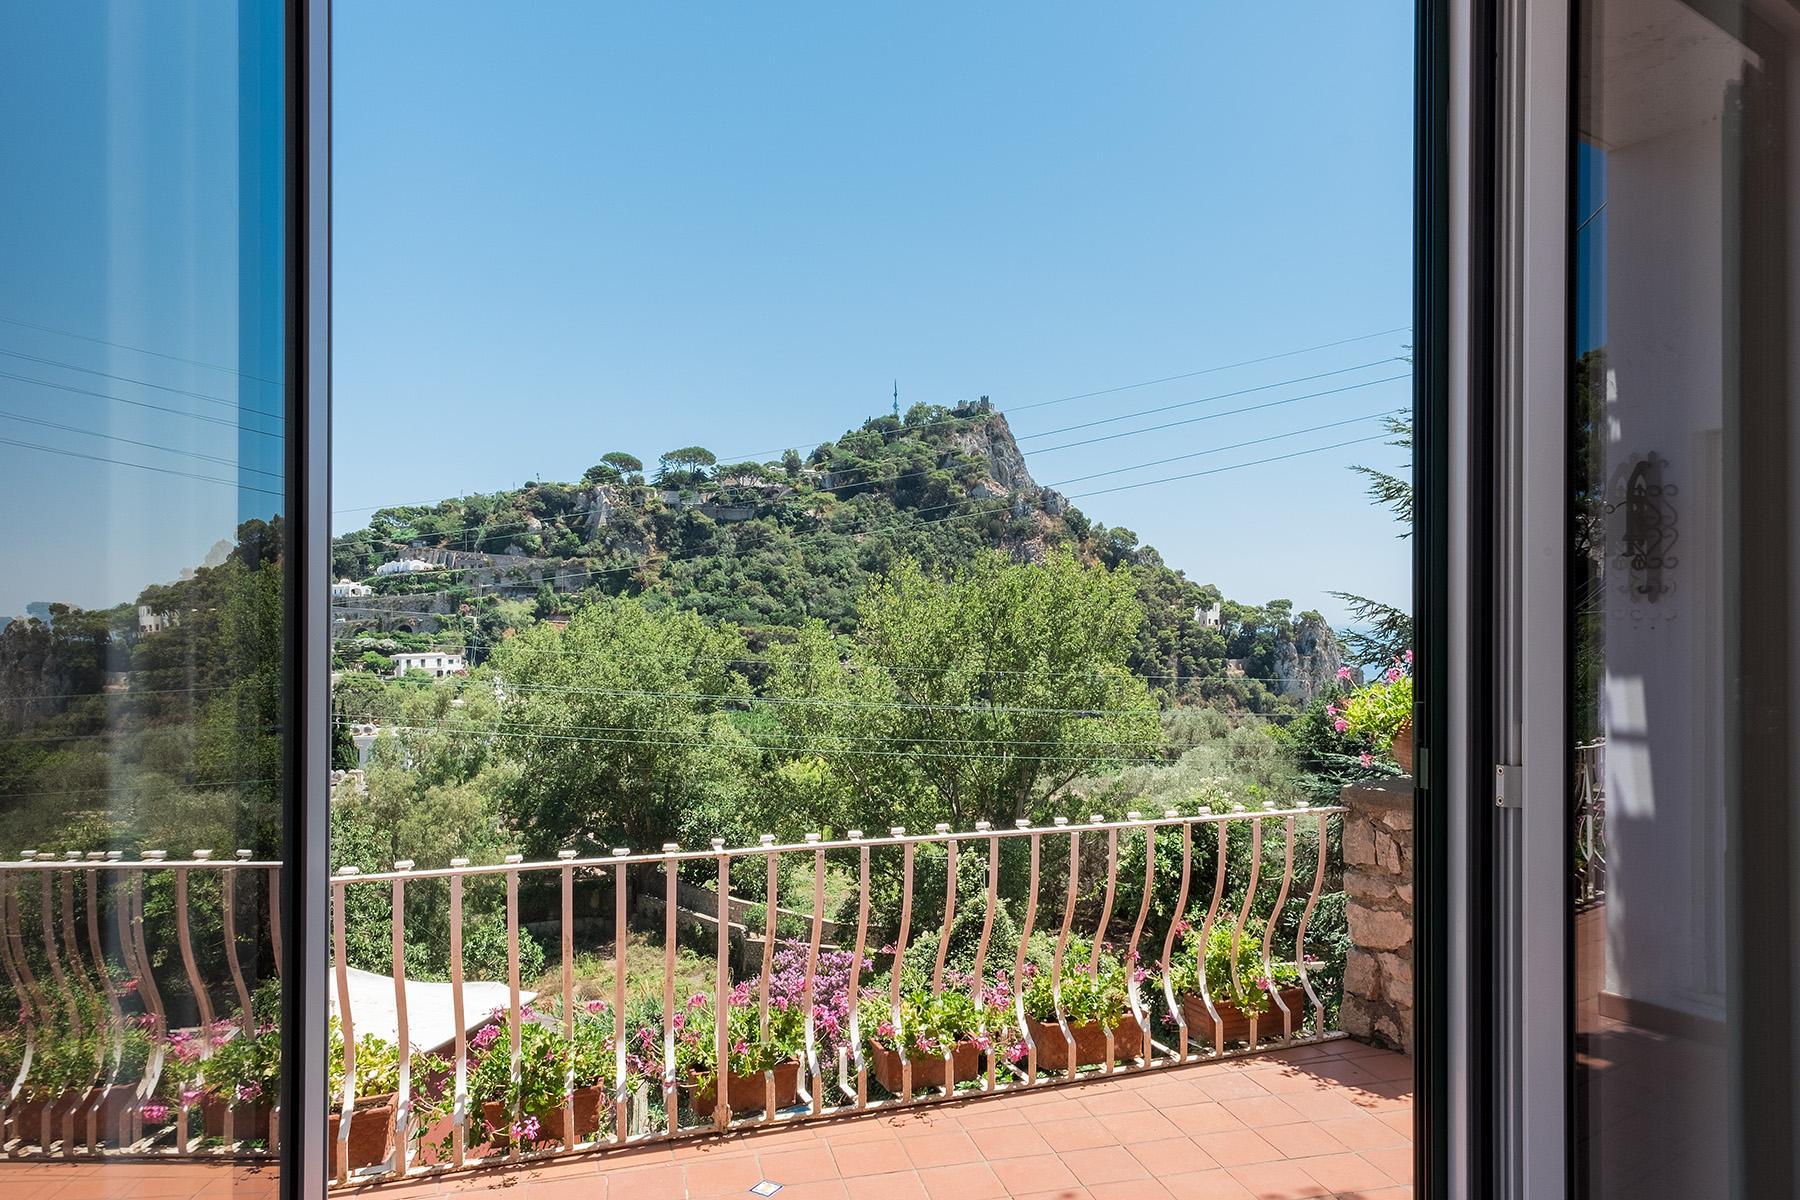 Прекрасная вилла с панорамным видом на море в центре легендарного острова Капри, Италия - 24